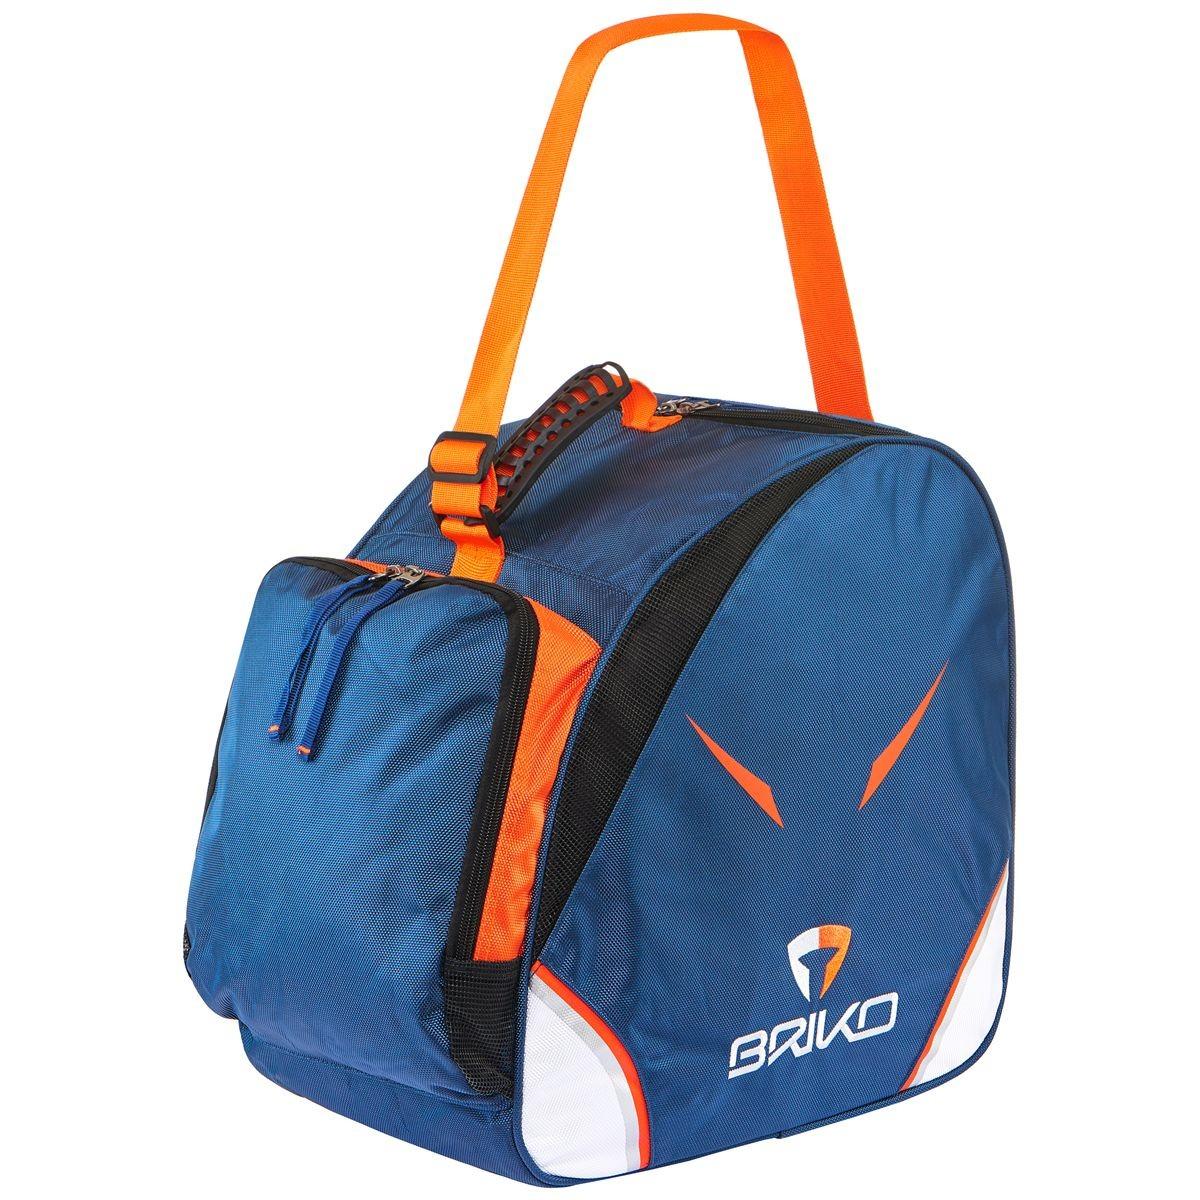 ac733c545d Briko Boot Bag - sacca porta scarponi blue su Mancini Store